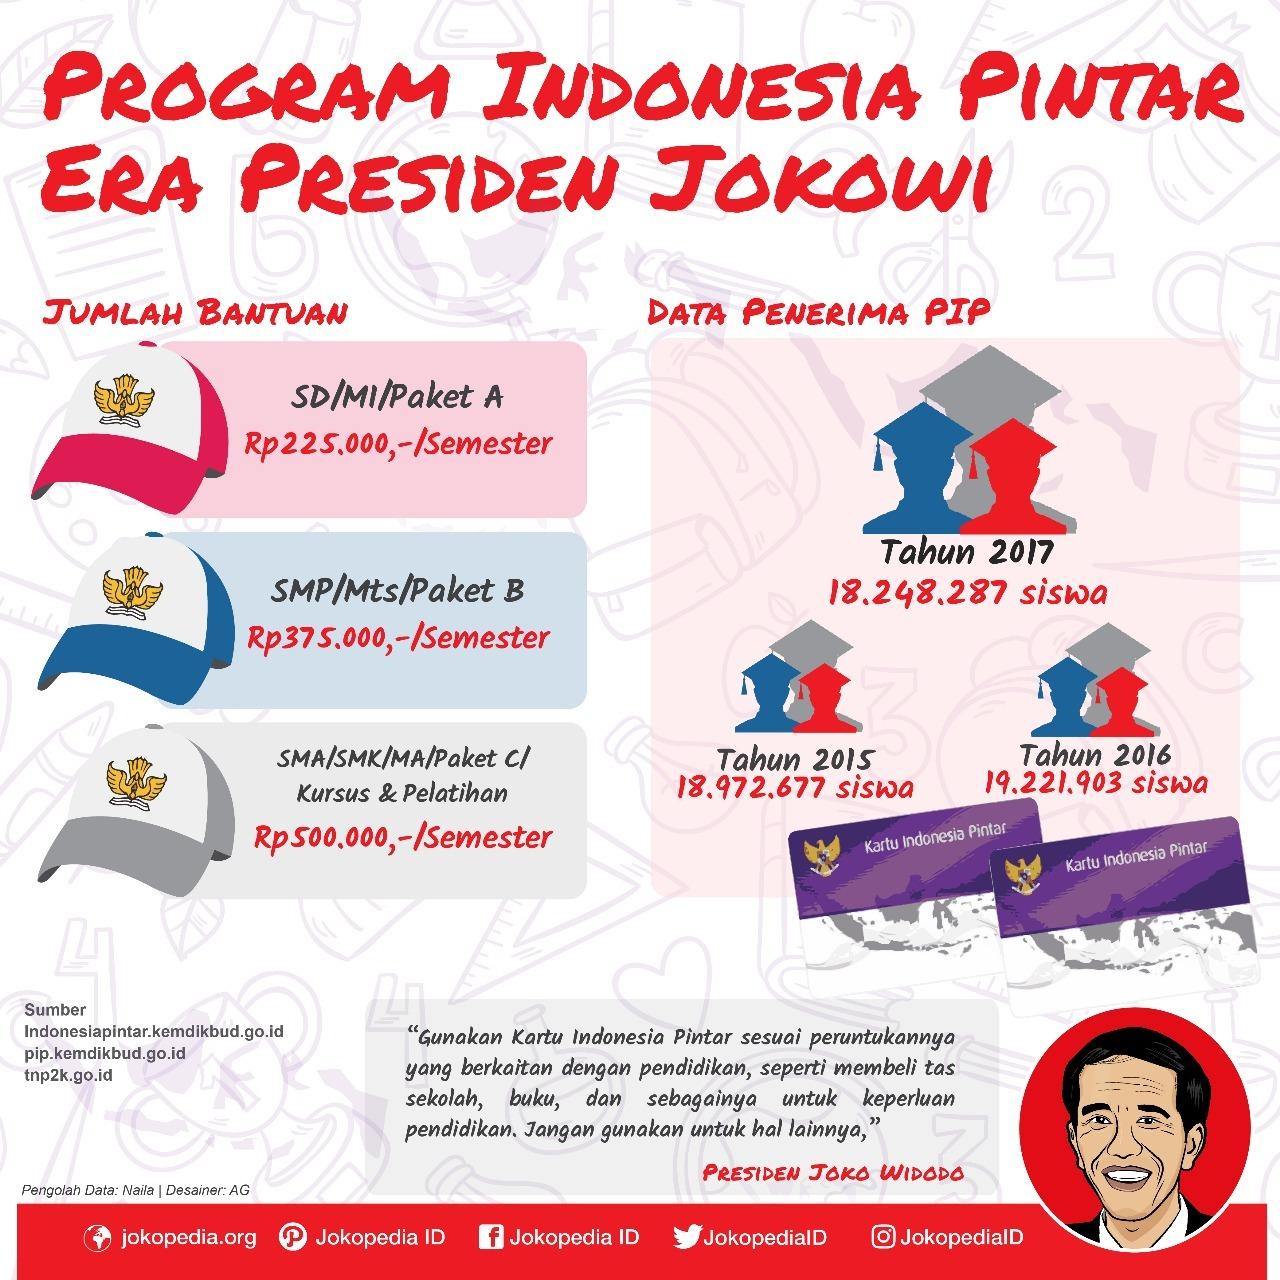 Program Indonesia Pintar Di Era Presiden Joko Widodo